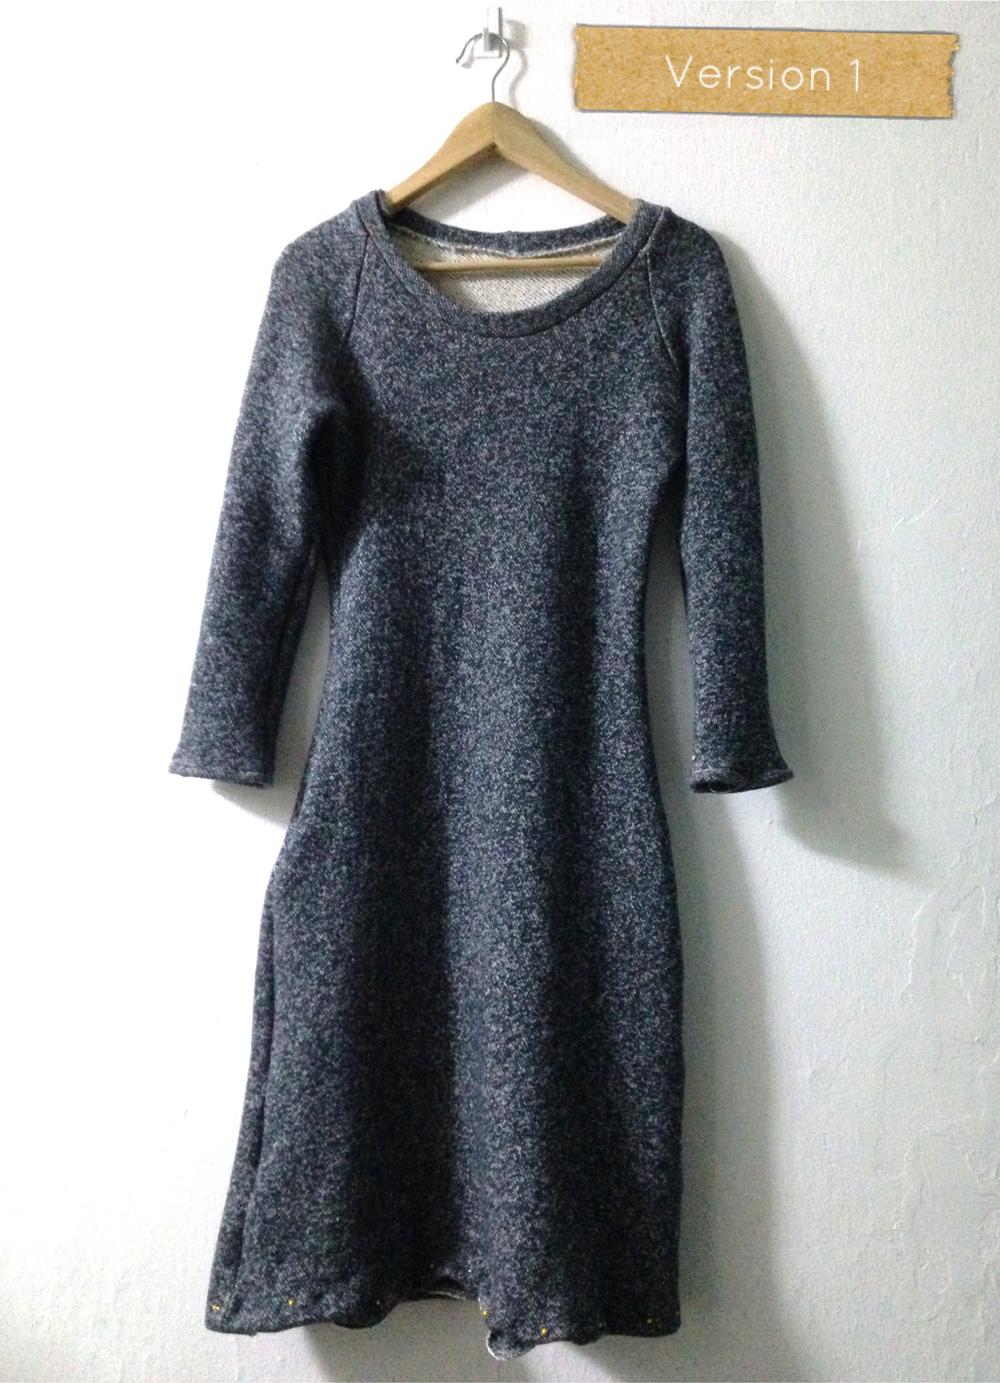 My Sweatshirt Dress, version 1